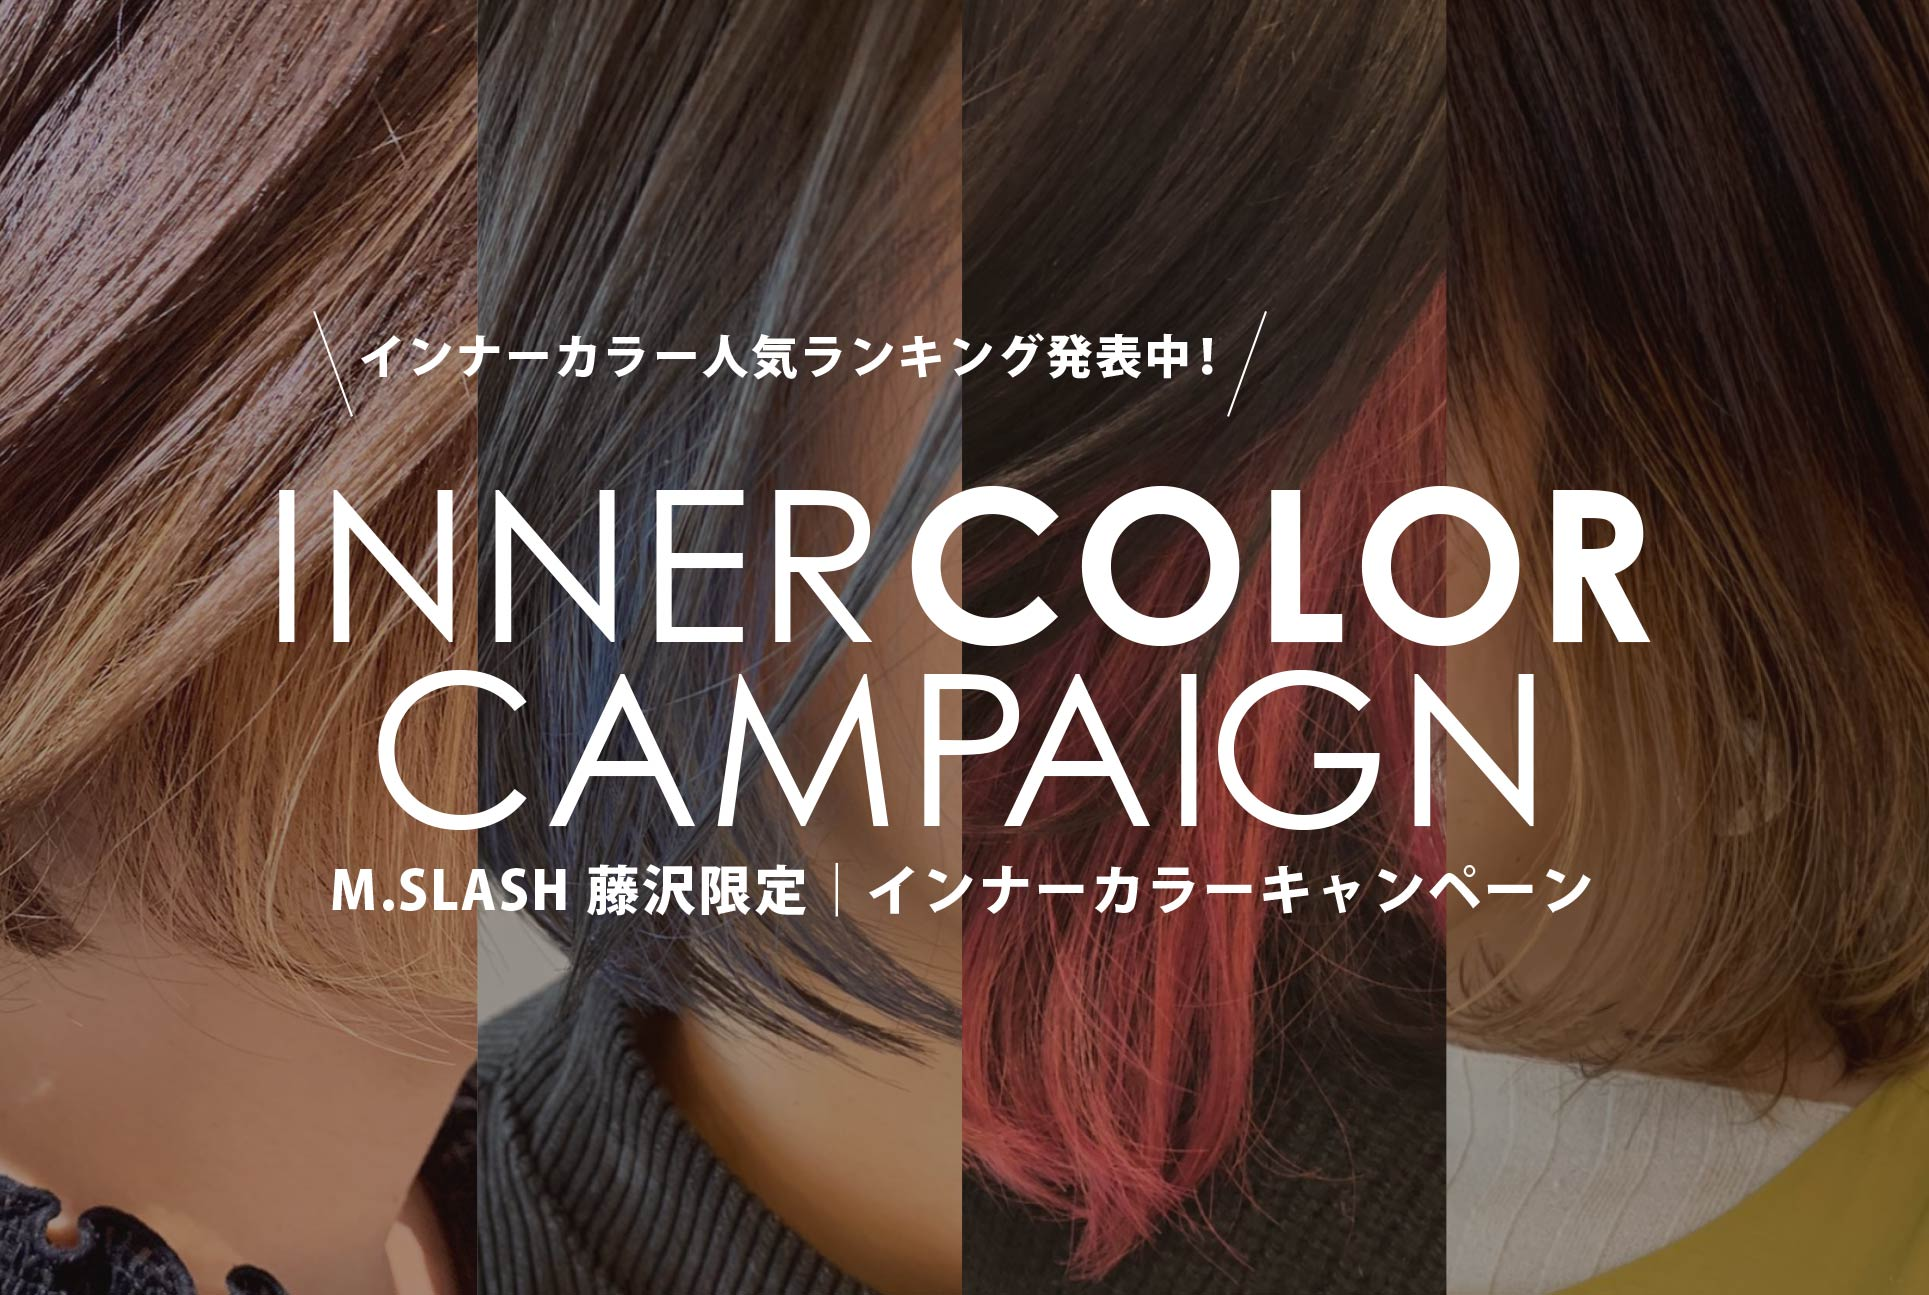 M.SLASH藤沢インナーカラーキャンペーン